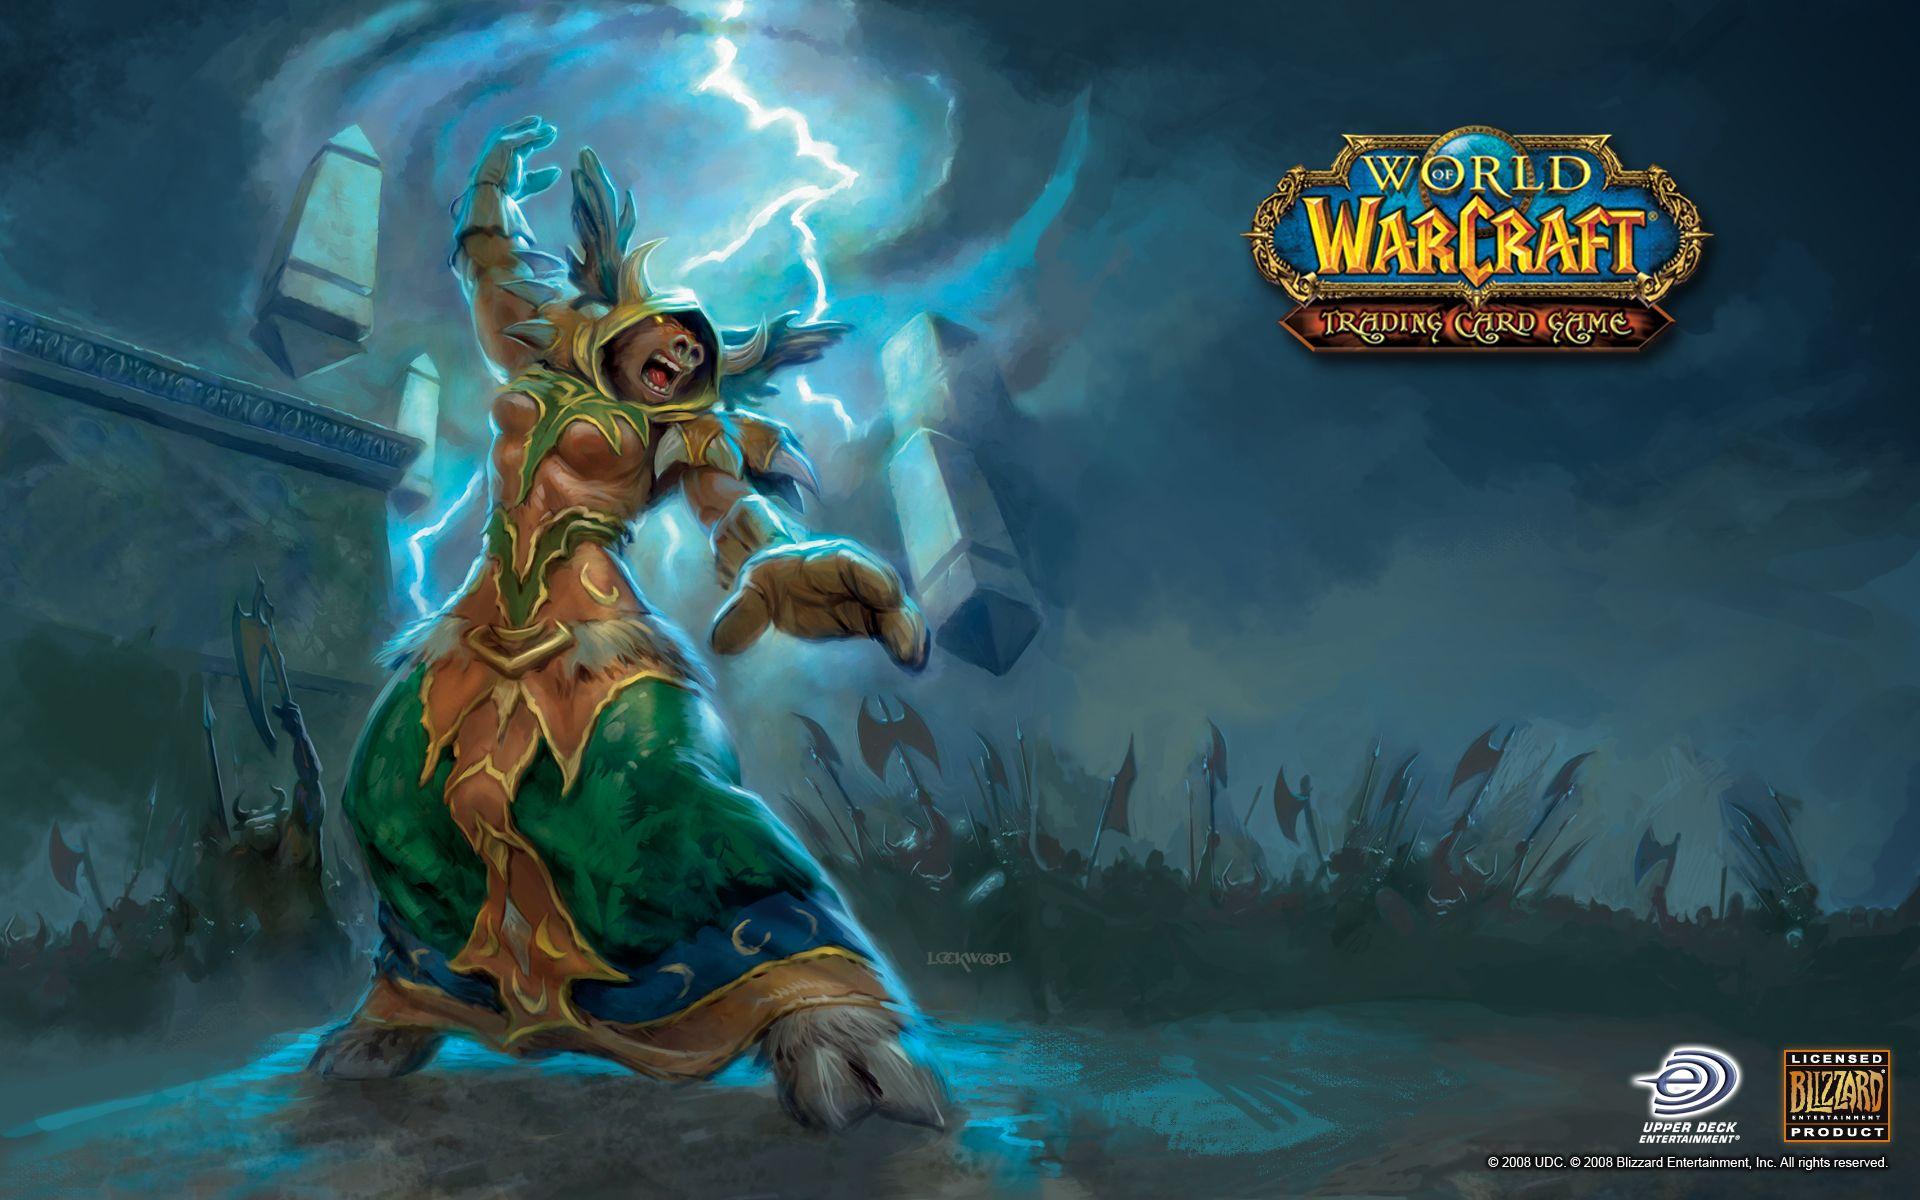 World Of Warcraft Wallpapers Druid Tauren Wallpaper41 Wallpaper Vault World Of Warcraft Warcraft World Of Warcraft Gold